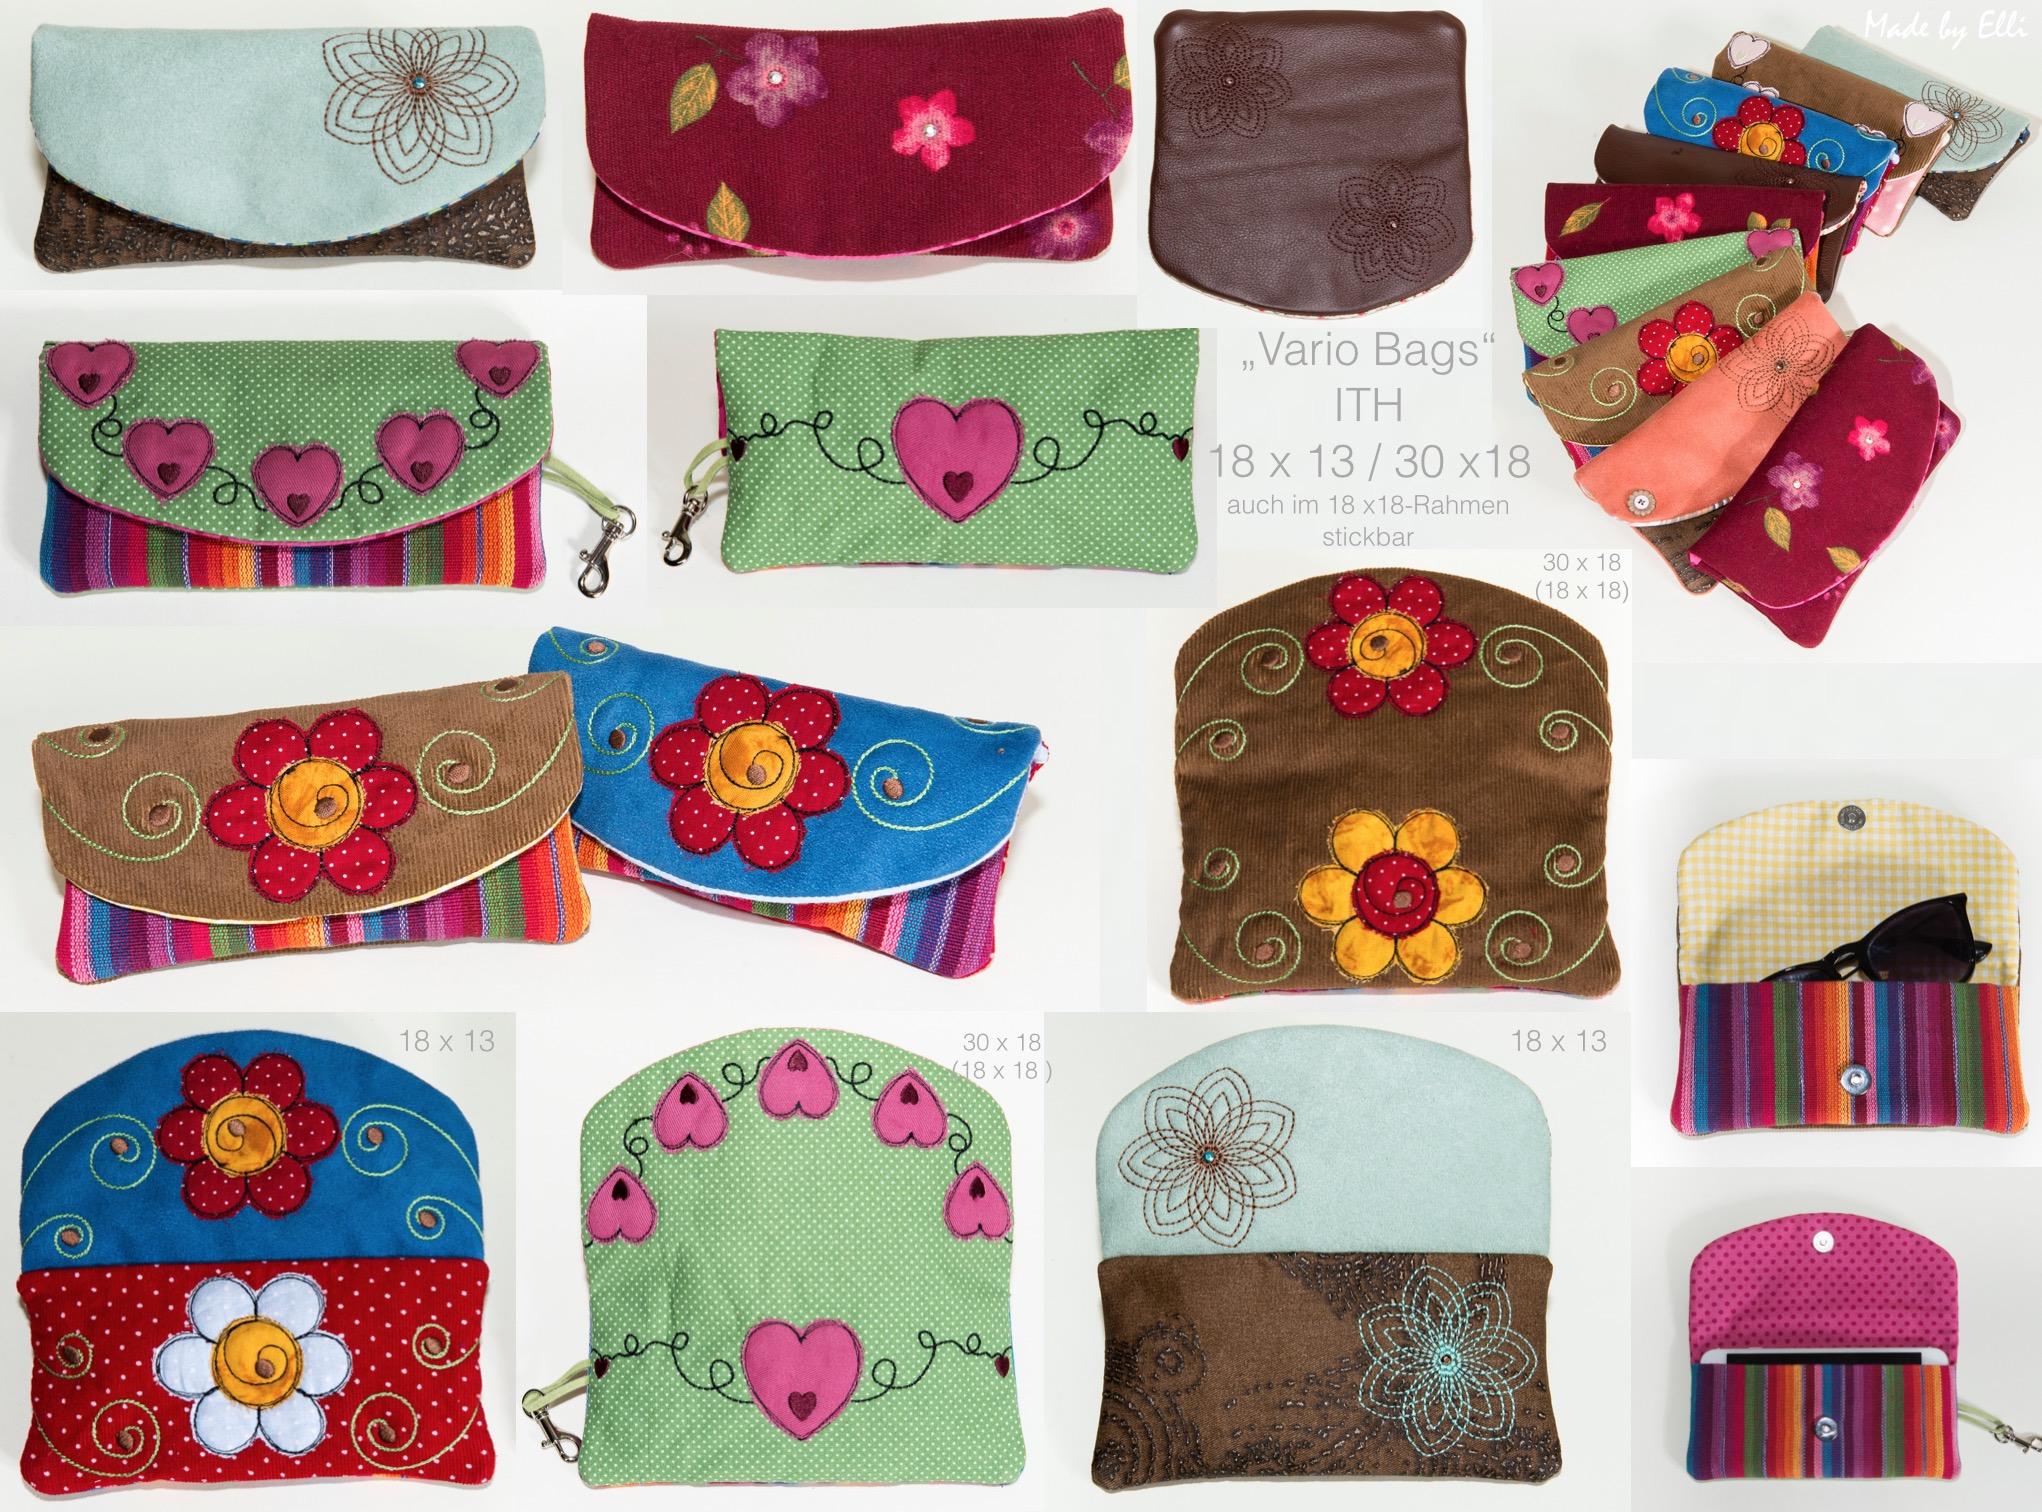 Vario Bags